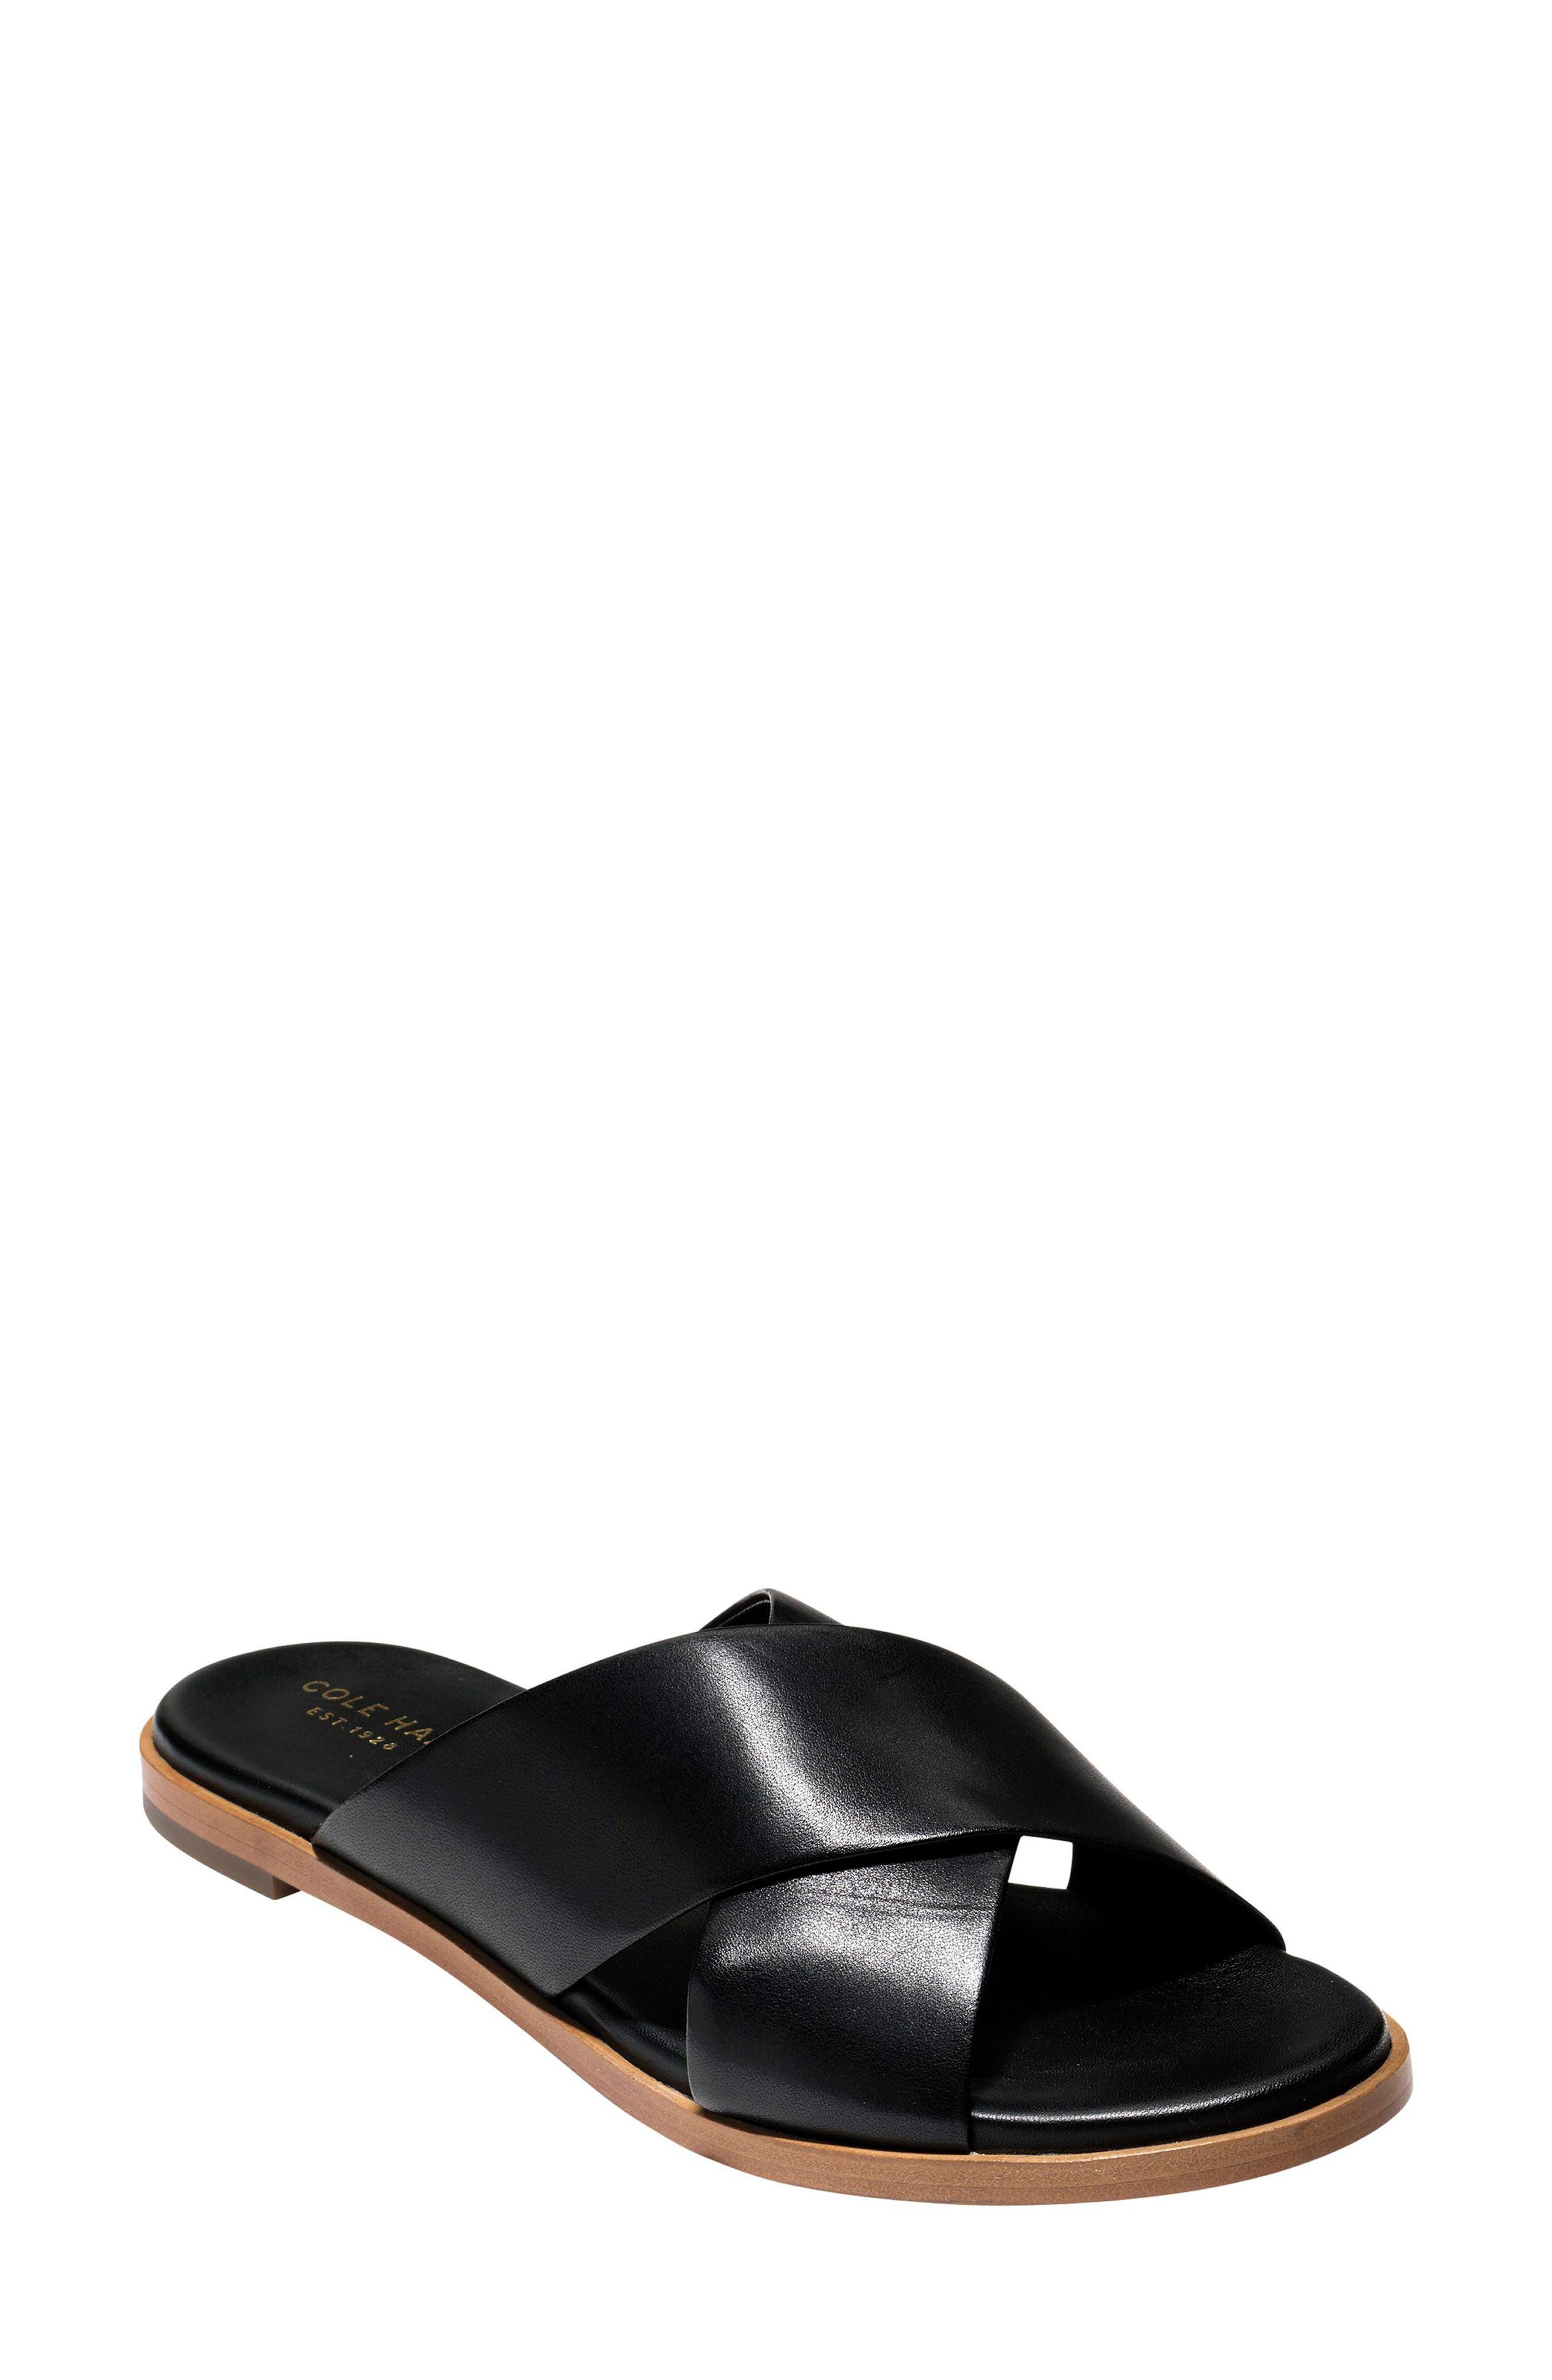 Alternate Image 1 Selected - Cole Haan Anica Slide Sandal (Women)